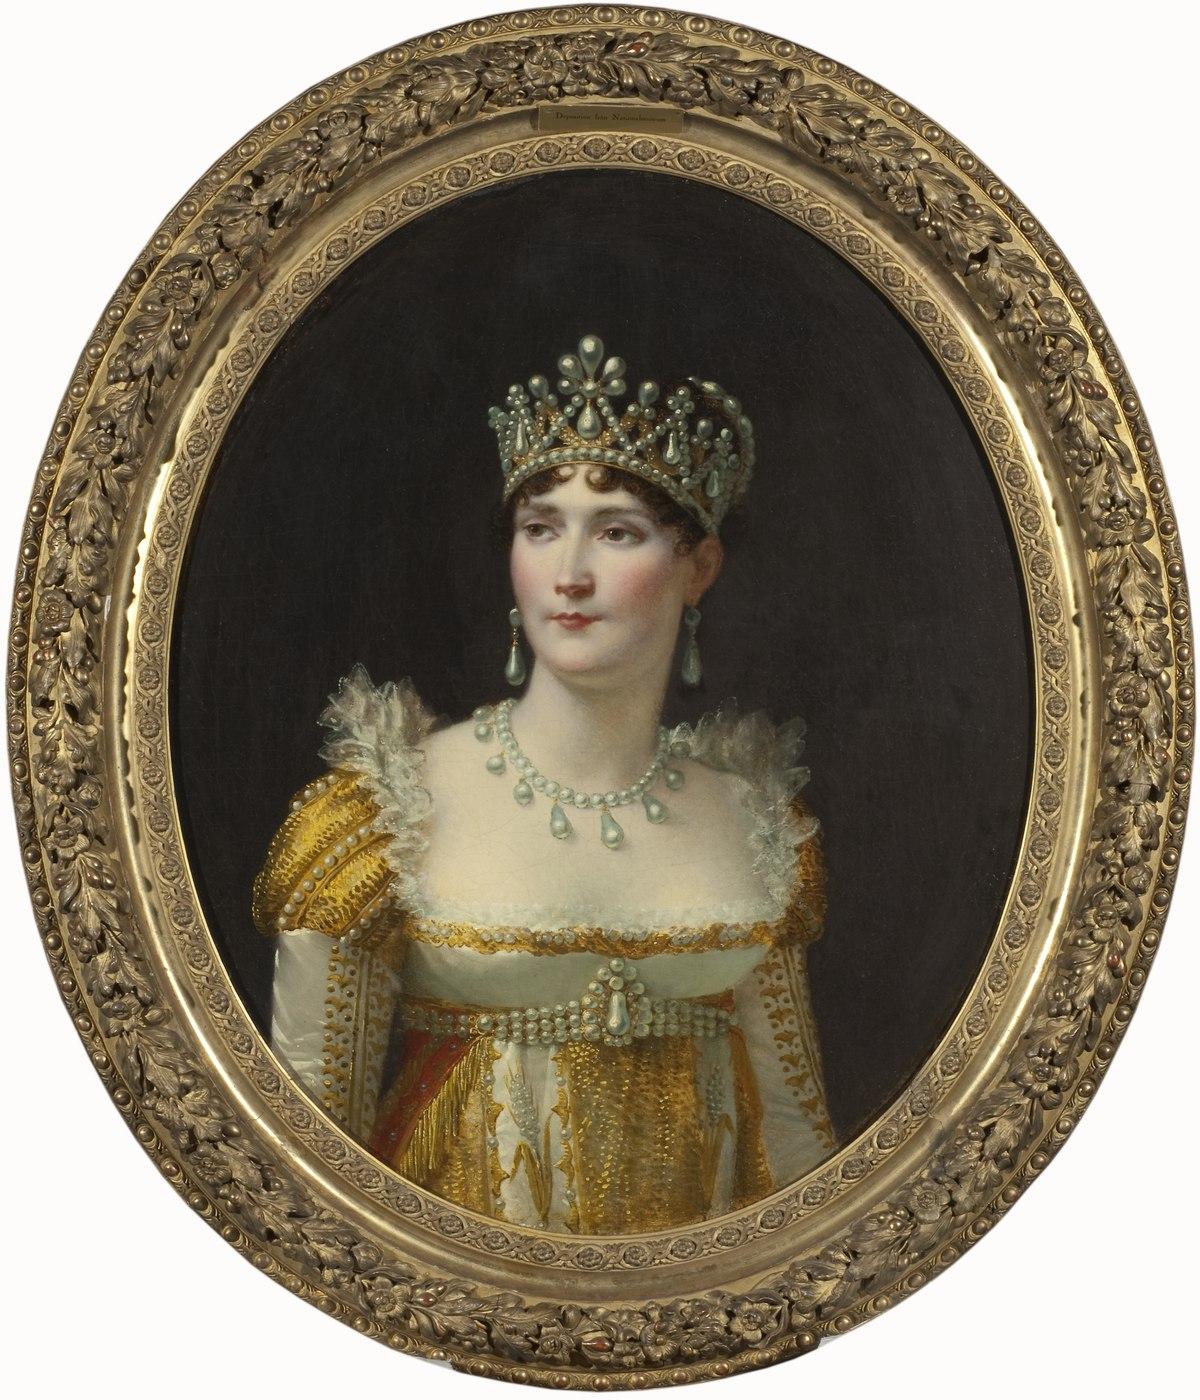 Empress Joséphine - Wikipedia